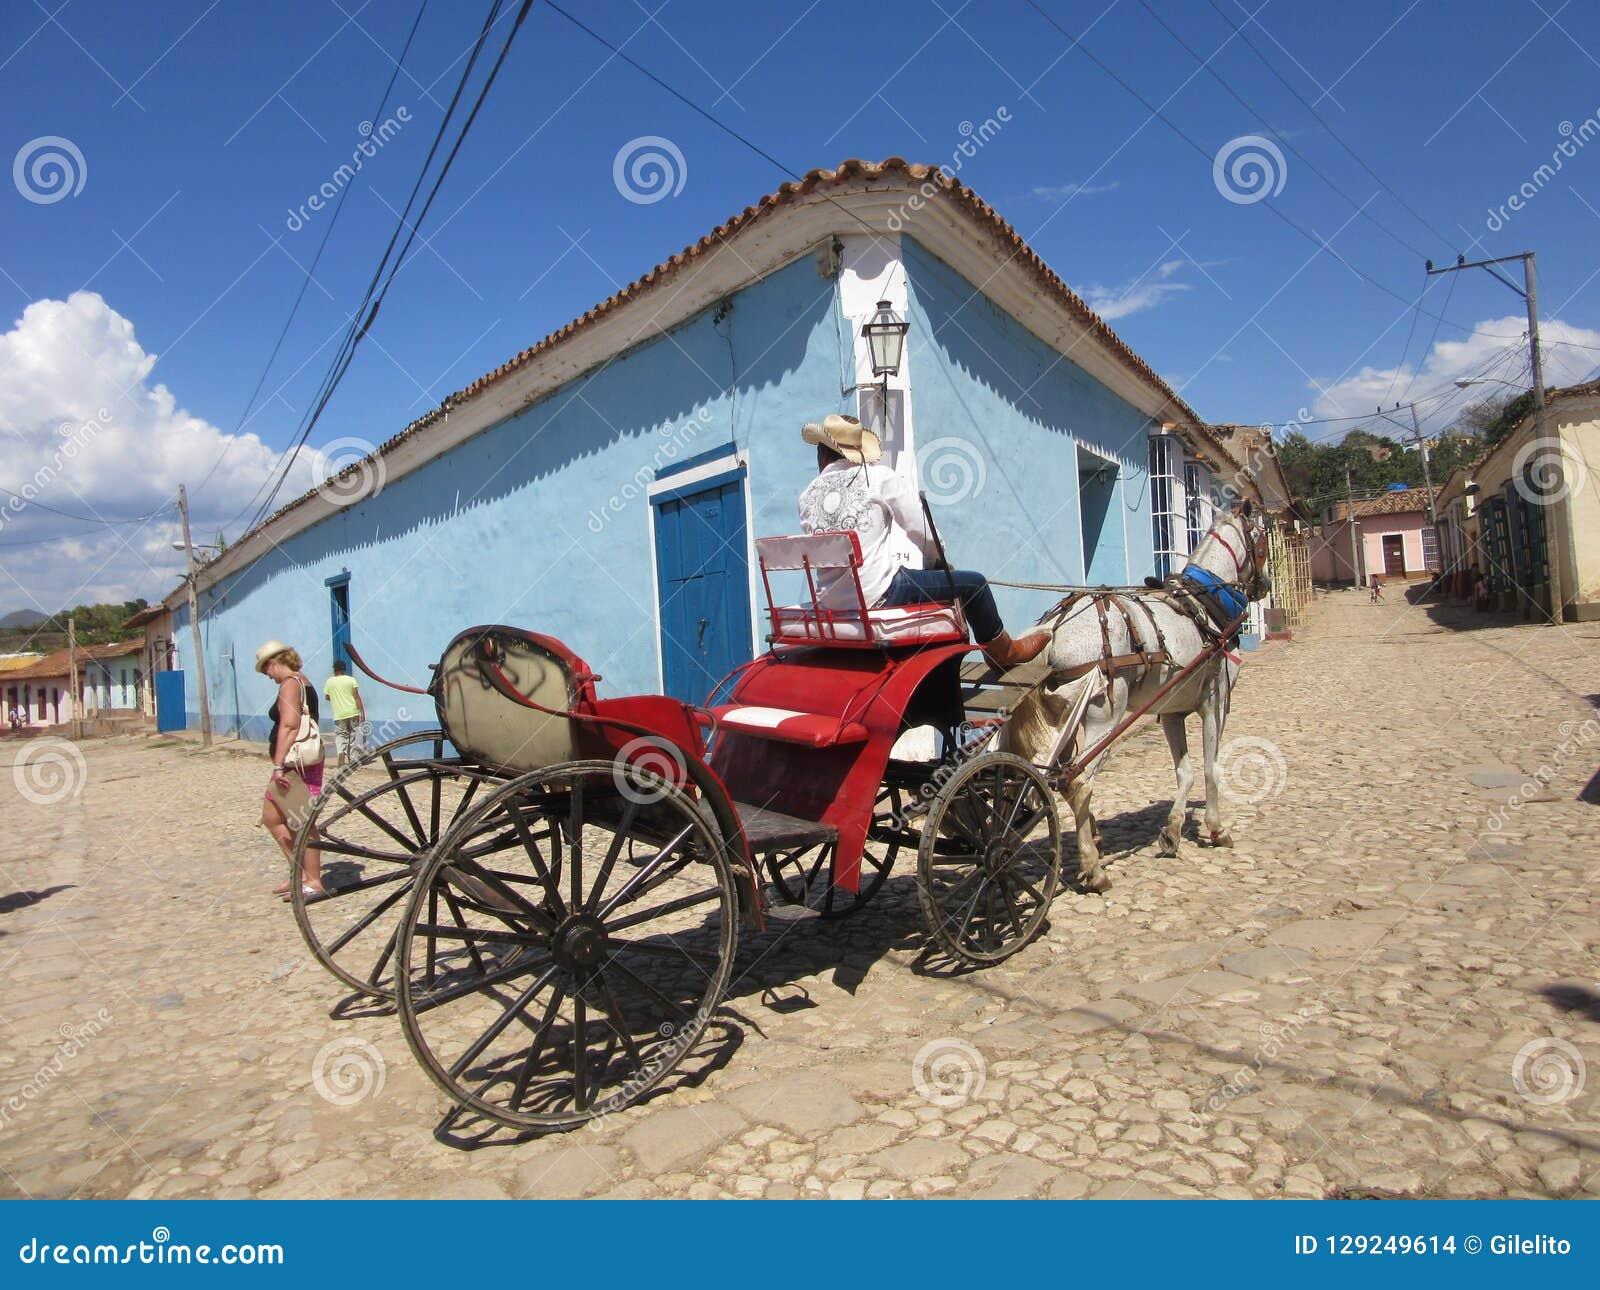 Horse-drawn Trinidad